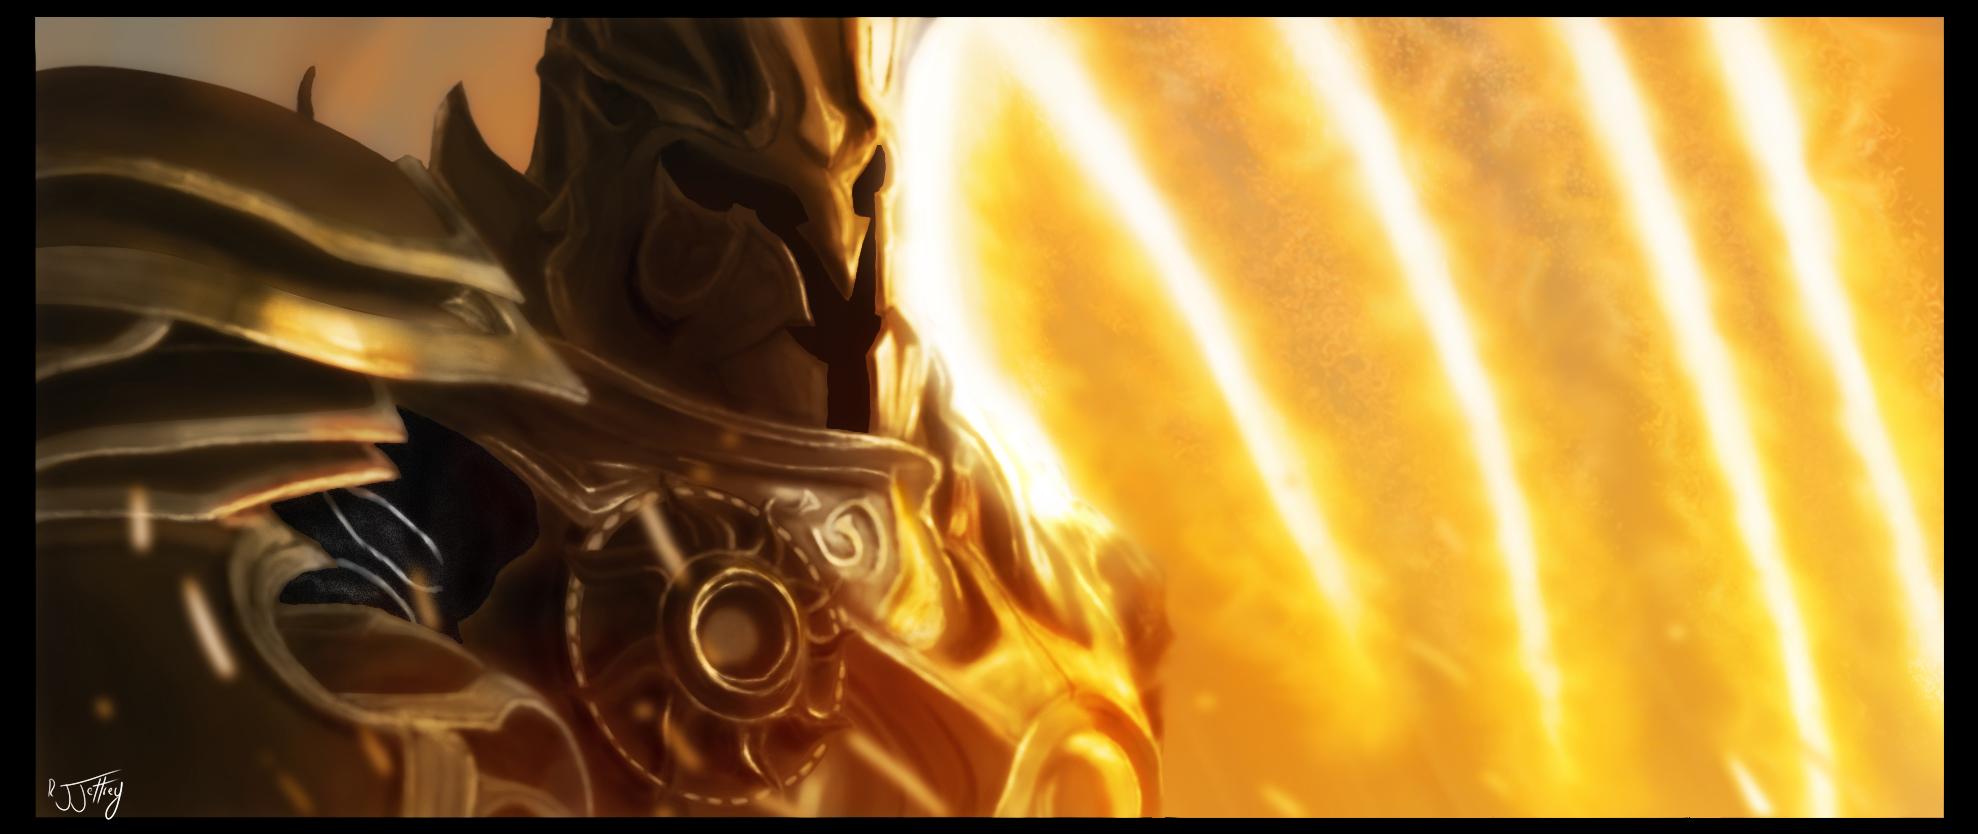 Diablo 3 - Imperius Attack by 3DPad